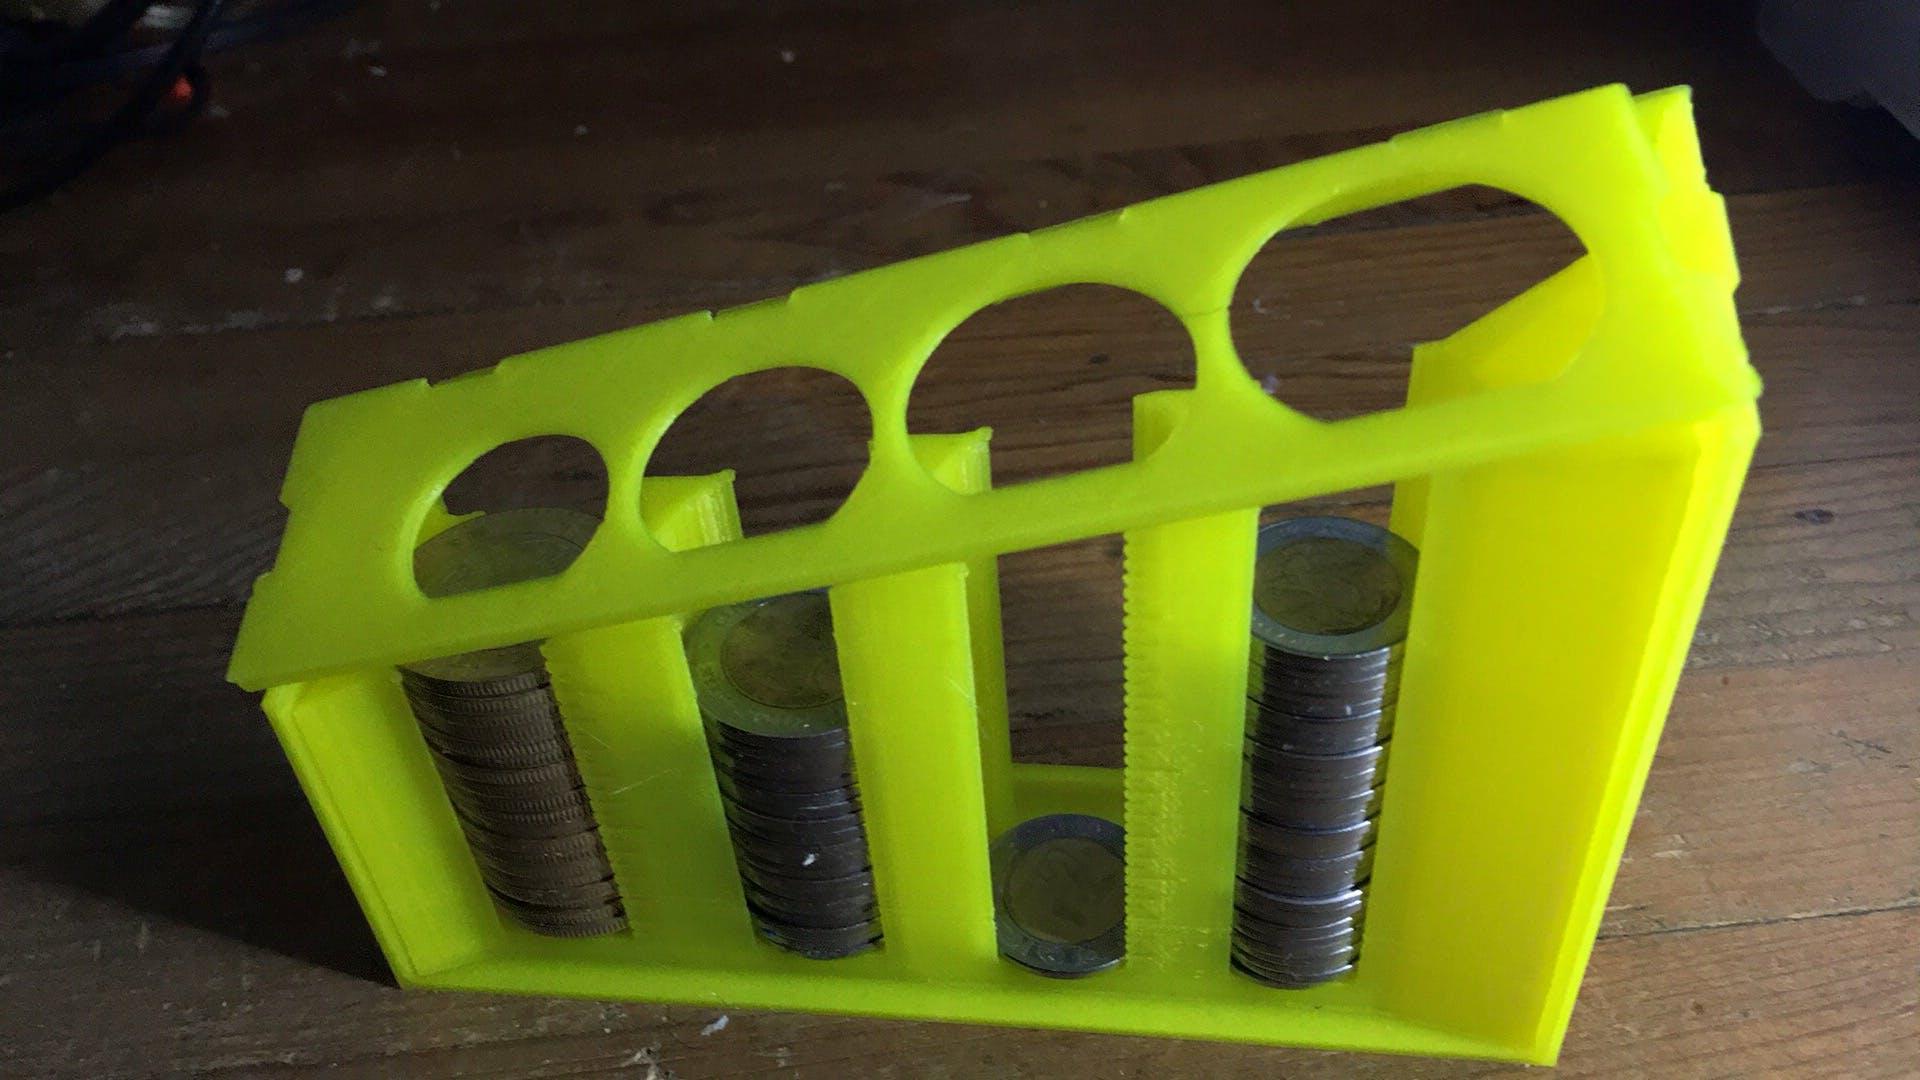 Customized Coin sorter